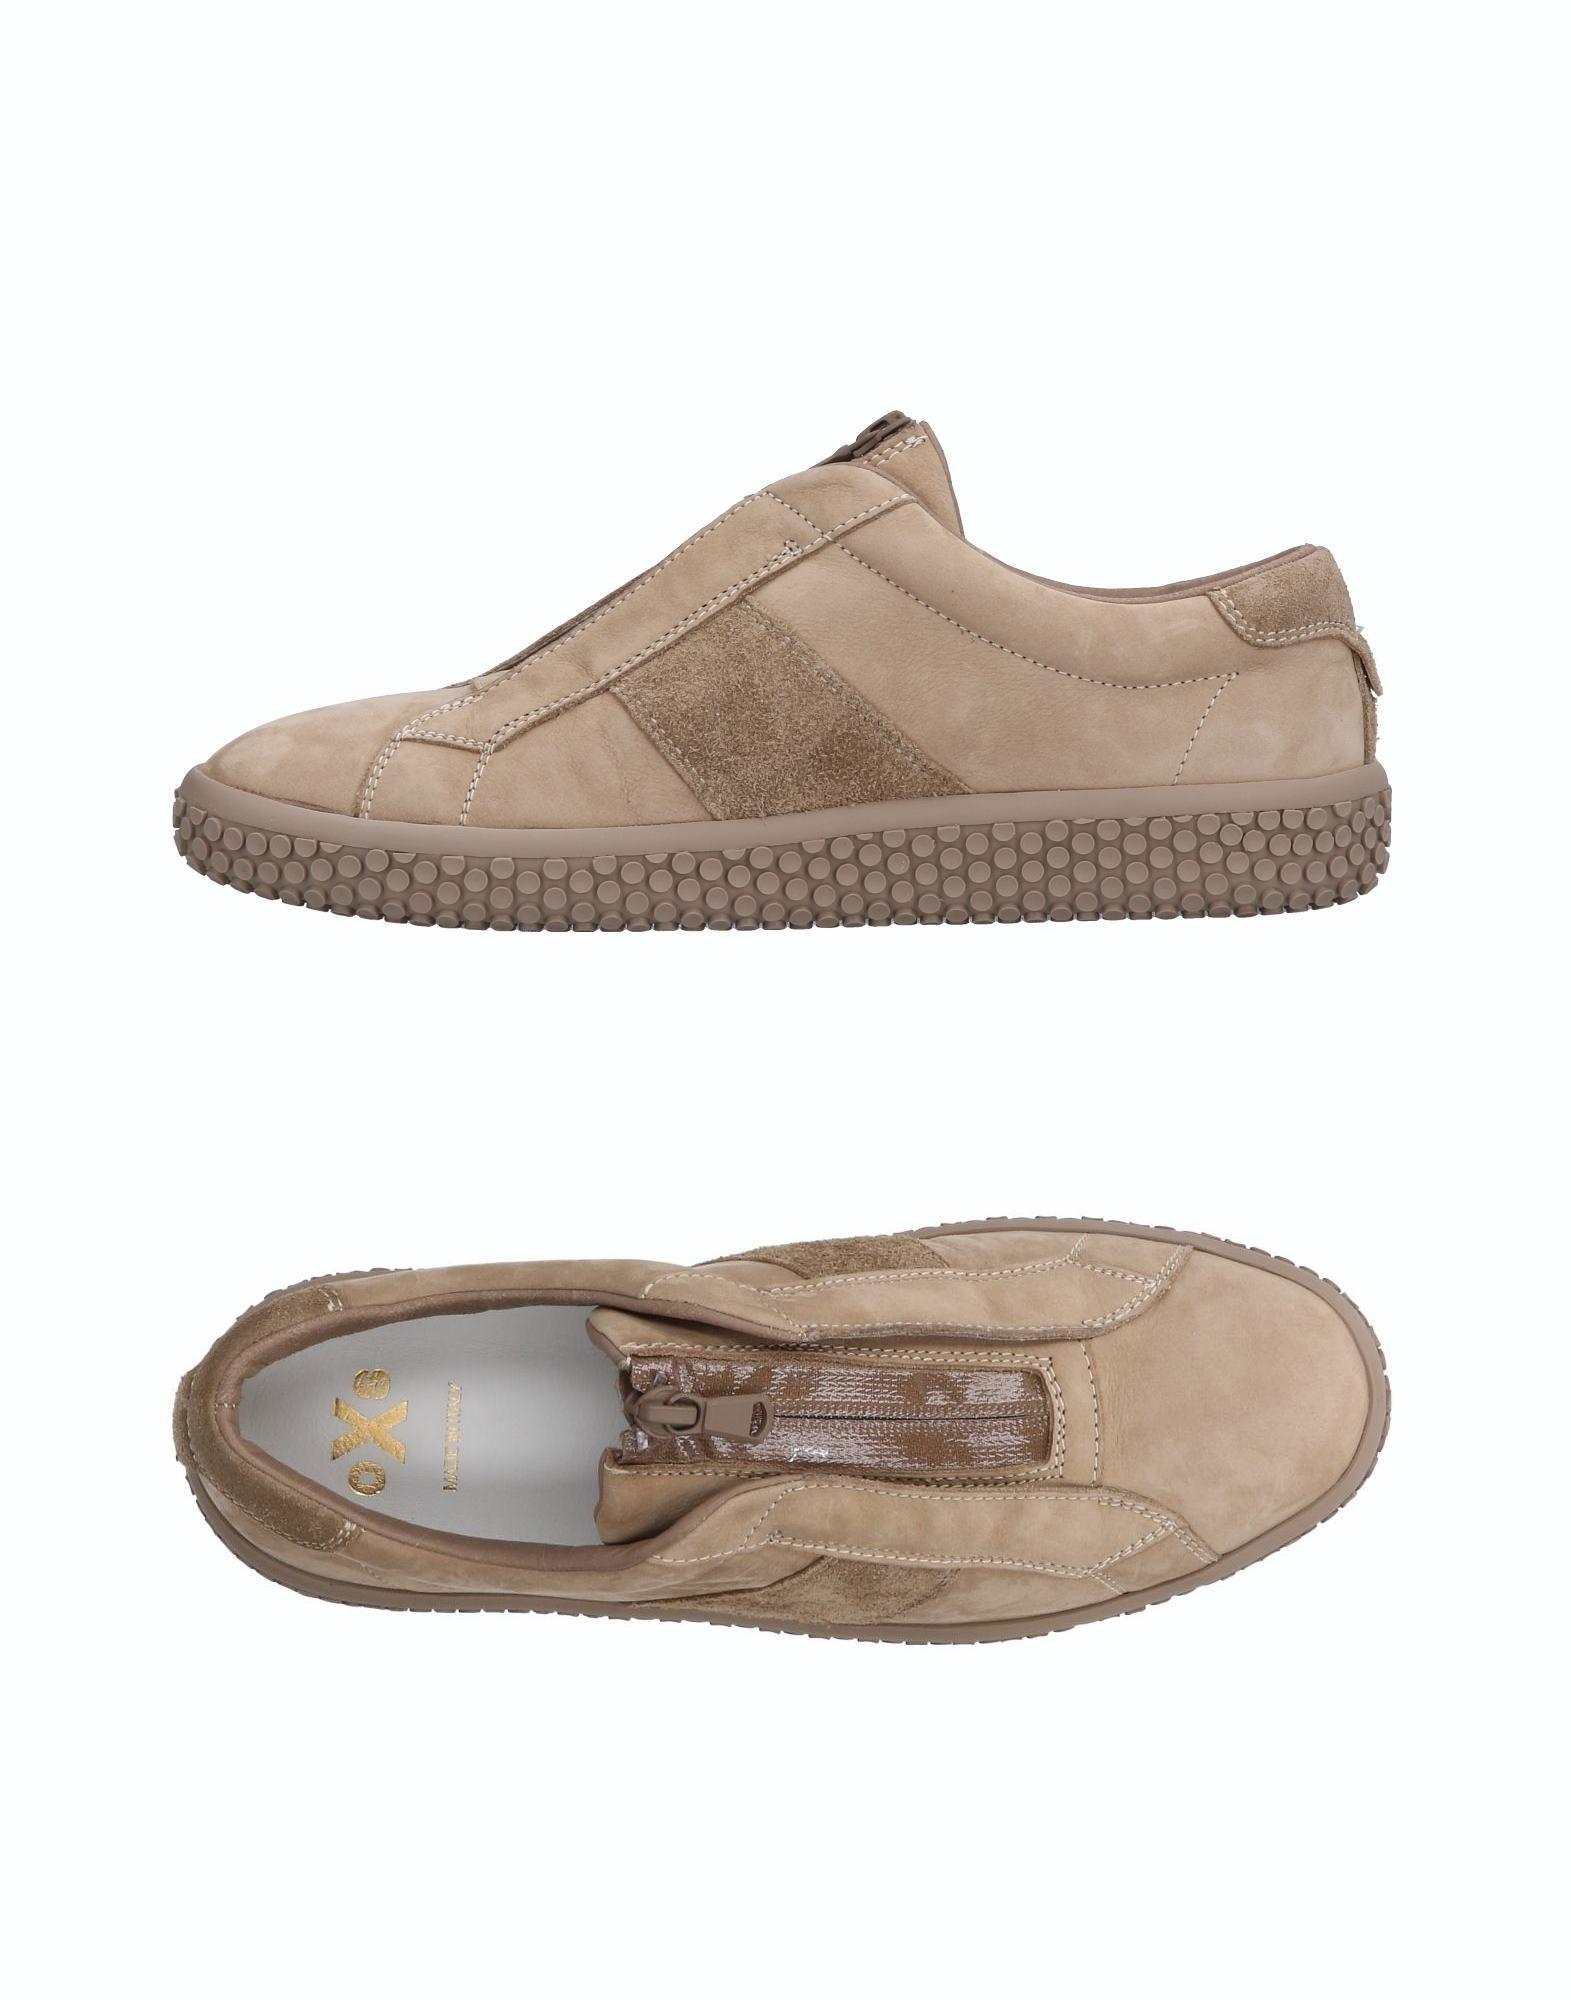 Zapatillas O.X.S. Mujer - Zapatillas O.X.S. Negro  Negro O.X.S. 8a9ff4